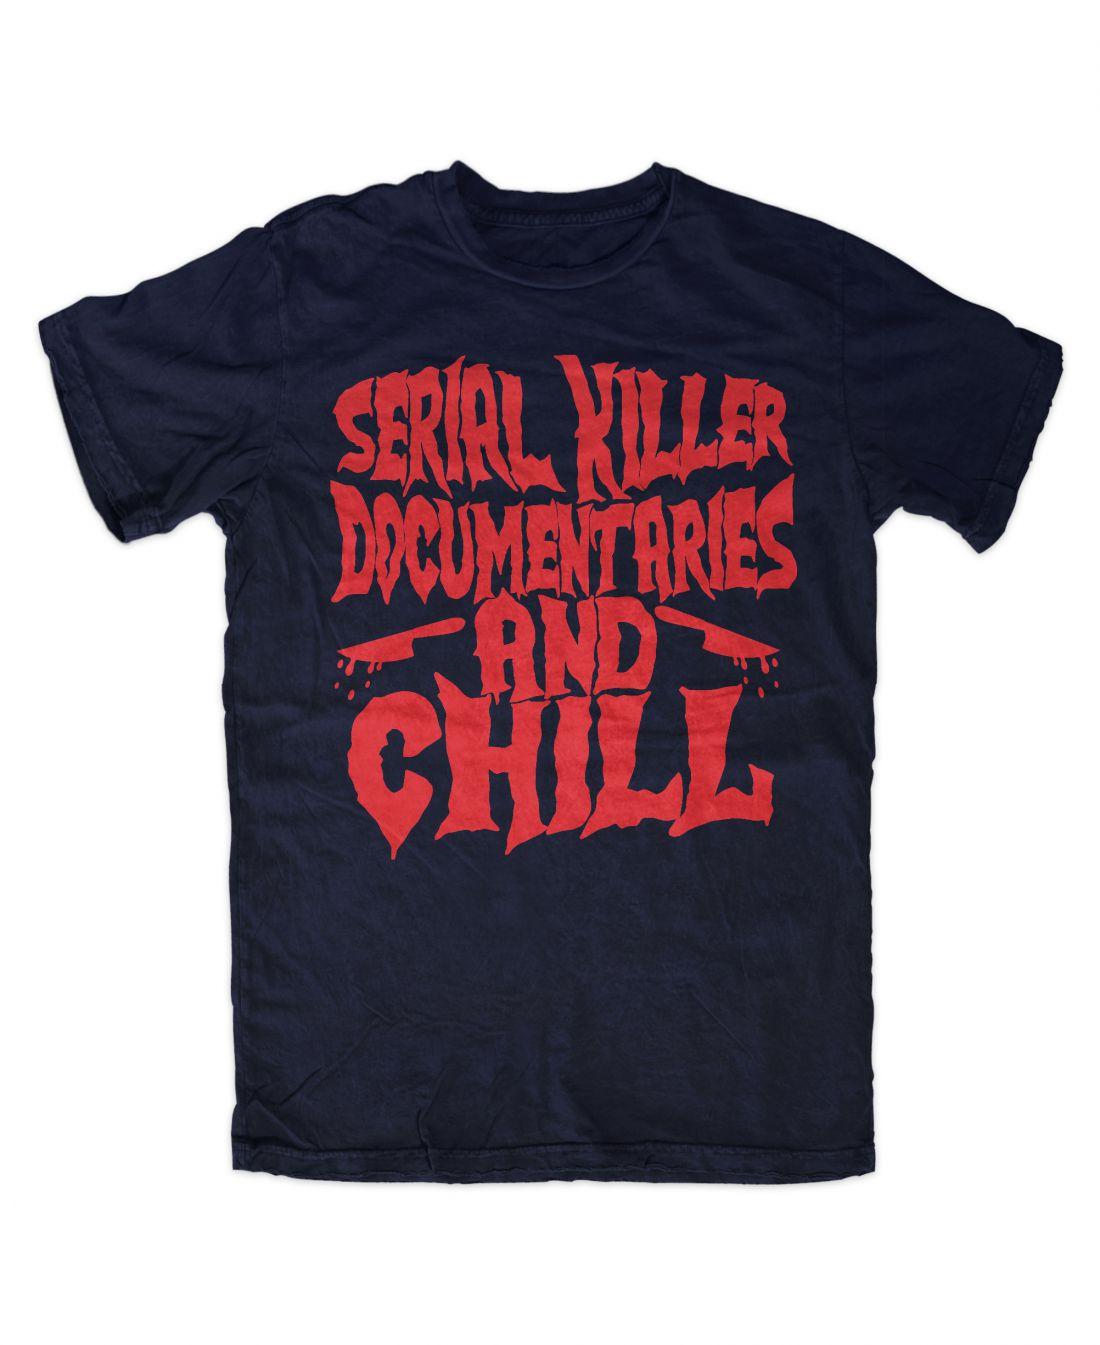 Serial Killer Documentaries (navy kék póló)